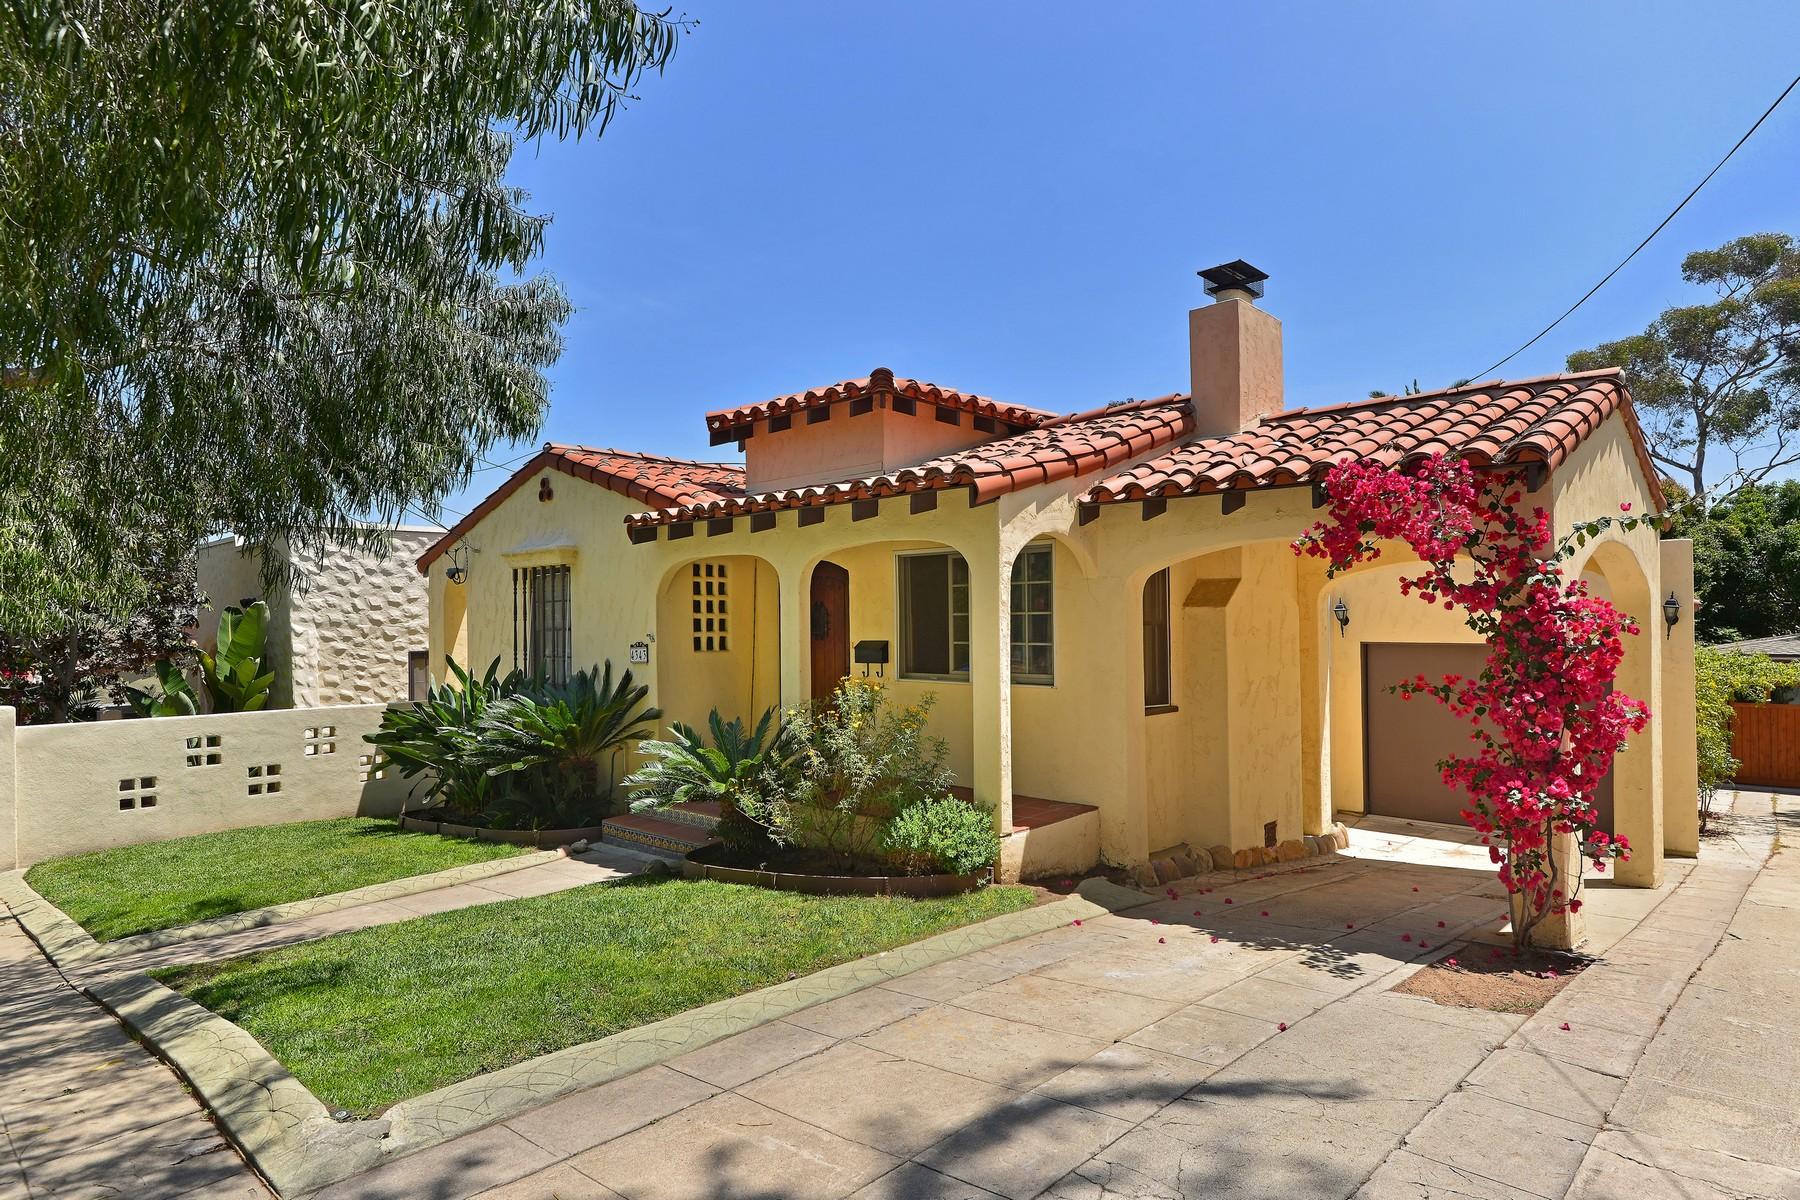 Additional photo for property listing at 4343 Hawk Street  圣地亚哥, 加利福尼亚州 92103 美国